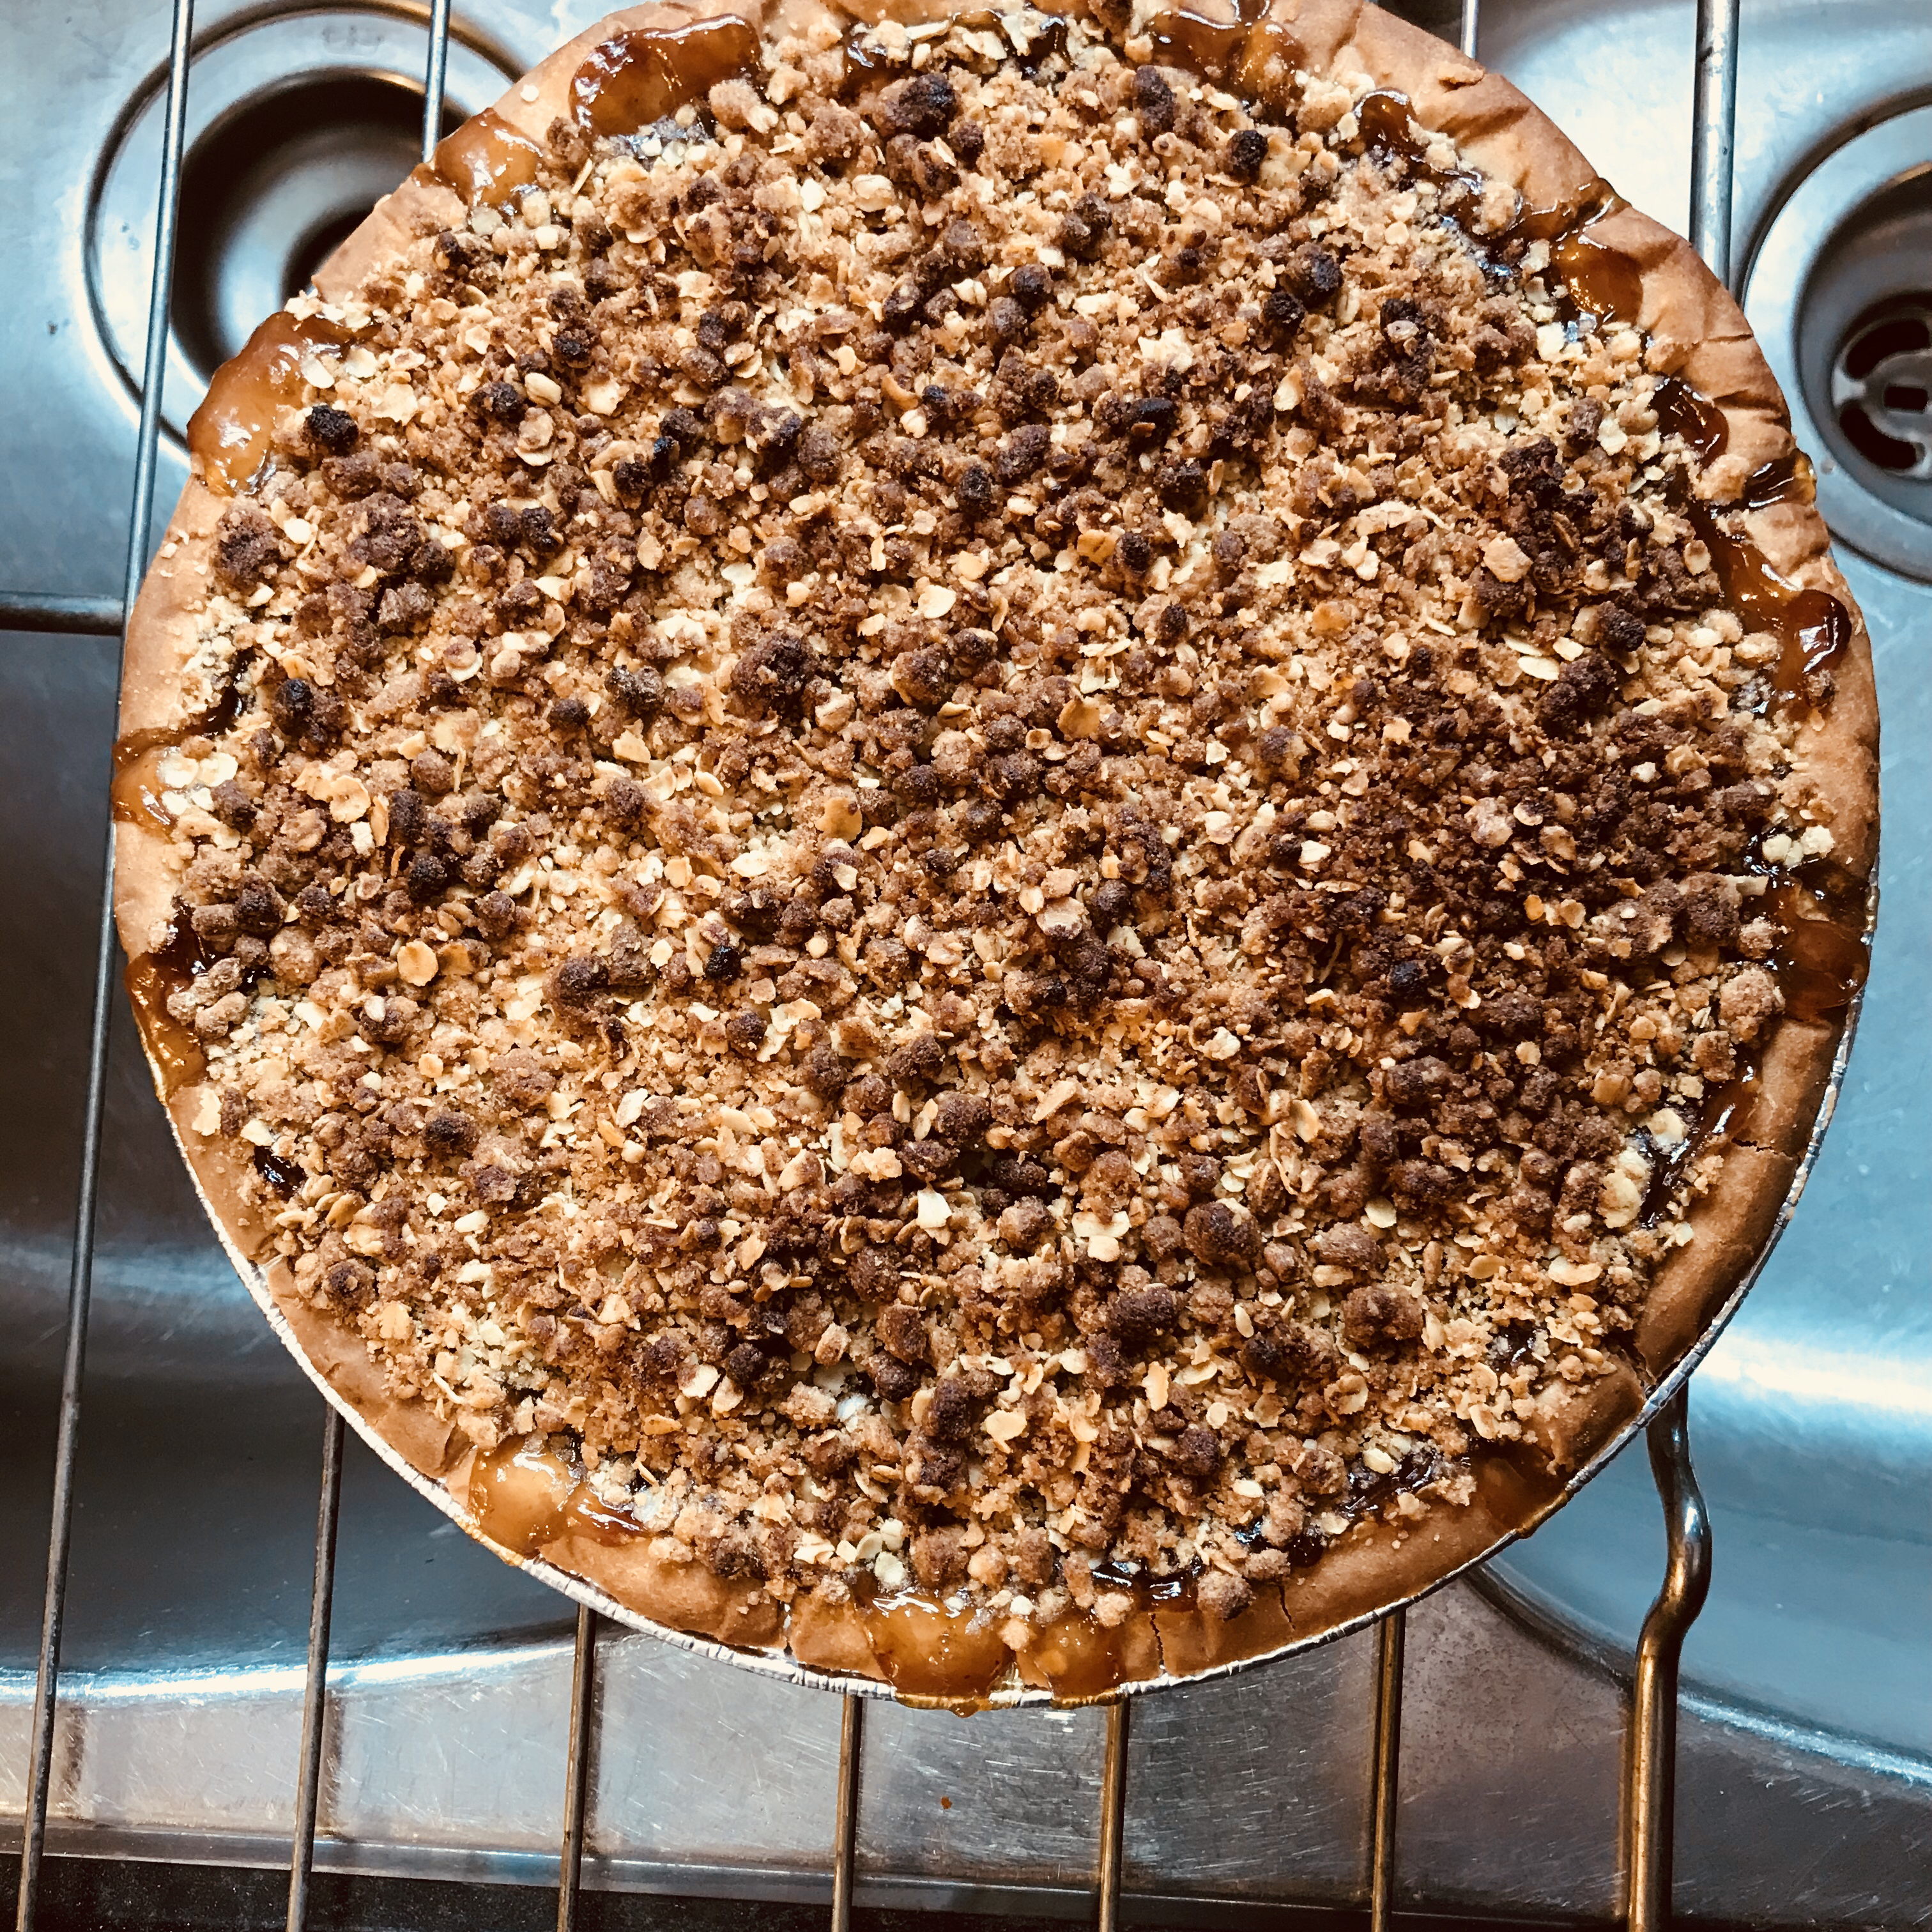 Simple Raisin Pie Theresa Nee Fox Ruel